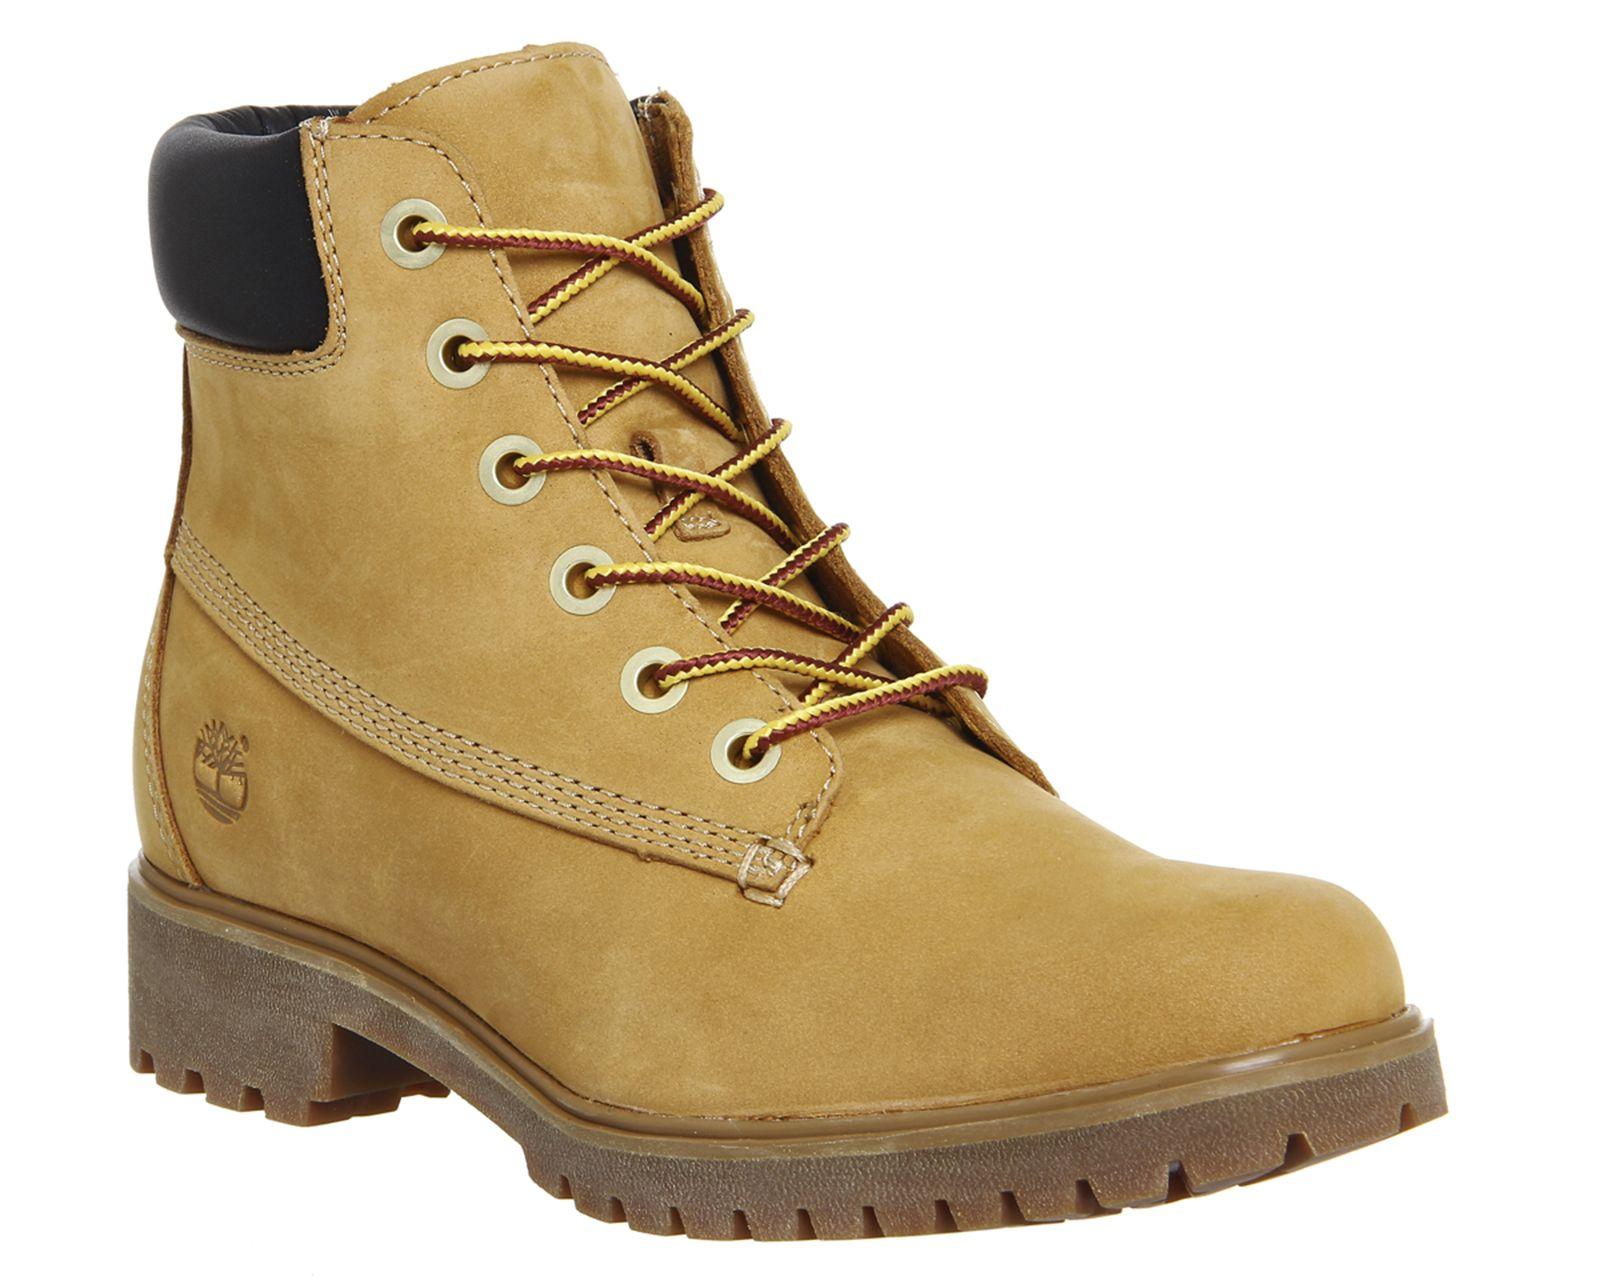 Buy Wheat Nubuck Timberland Slim 6inch Premium Boots from OFFICE.co.uk.